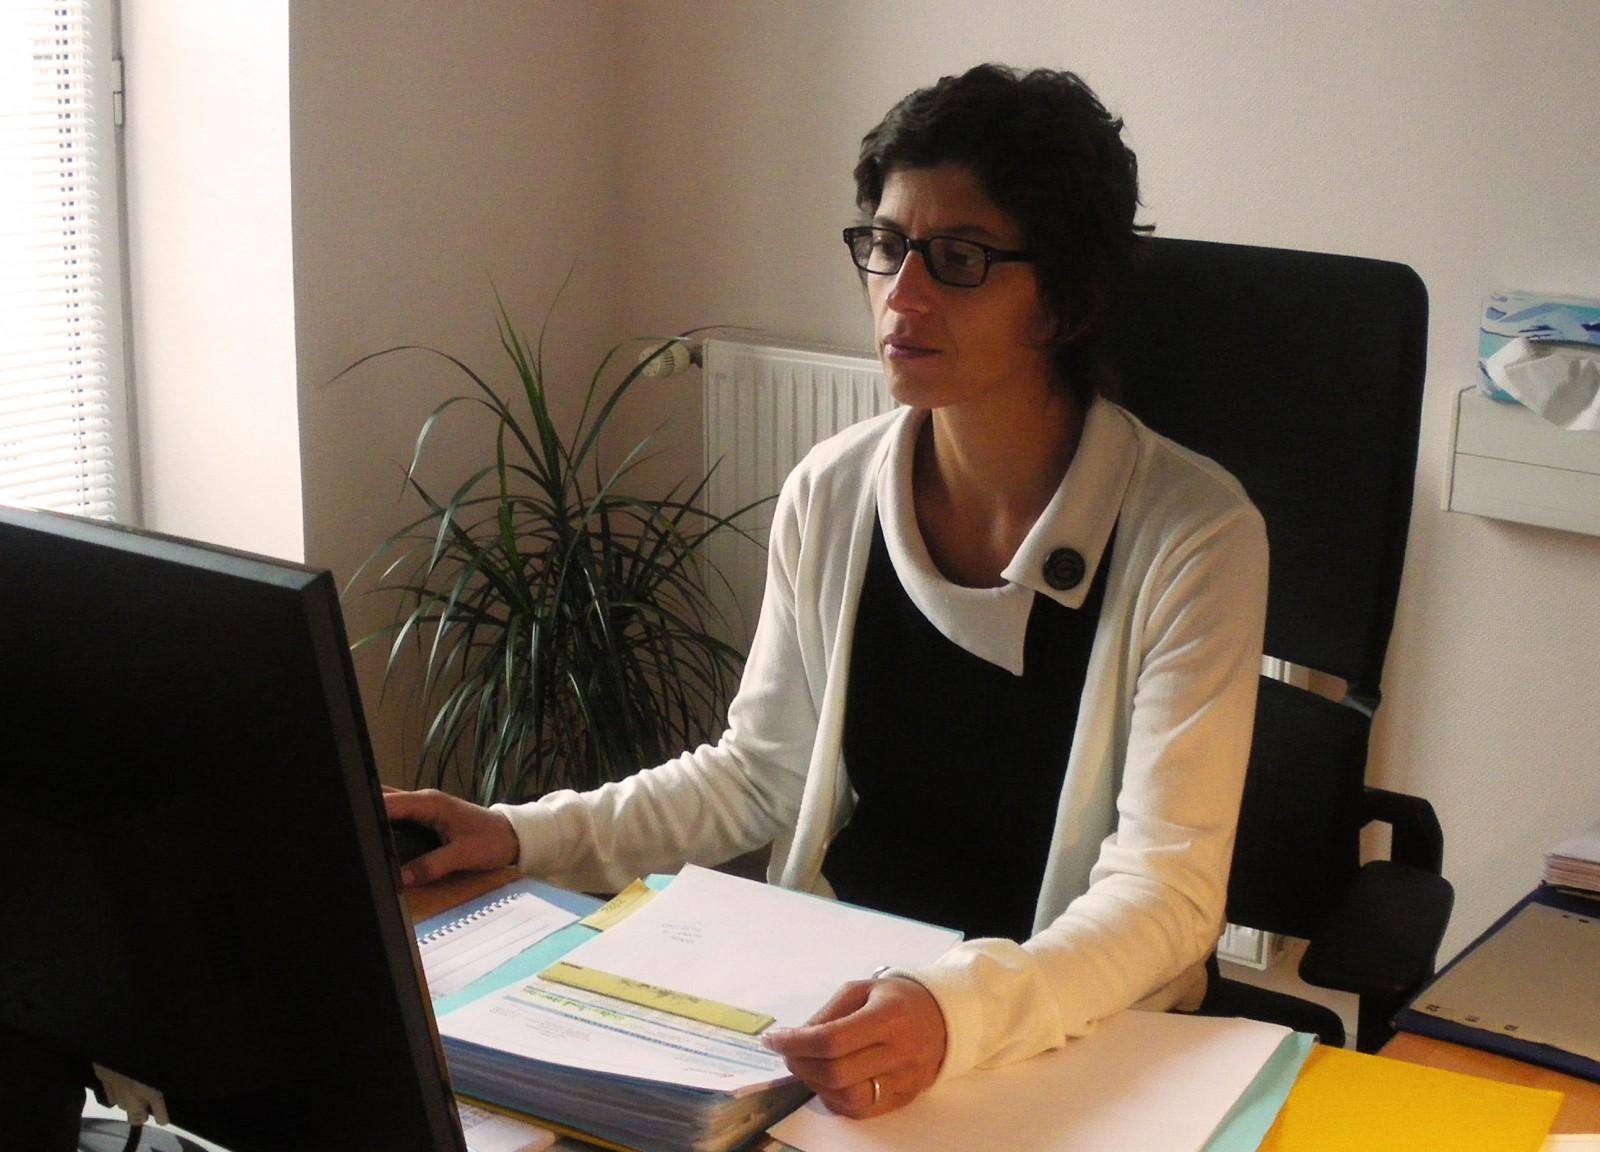 Emploi Services Gramat - Chrystelle Susset - Comptable